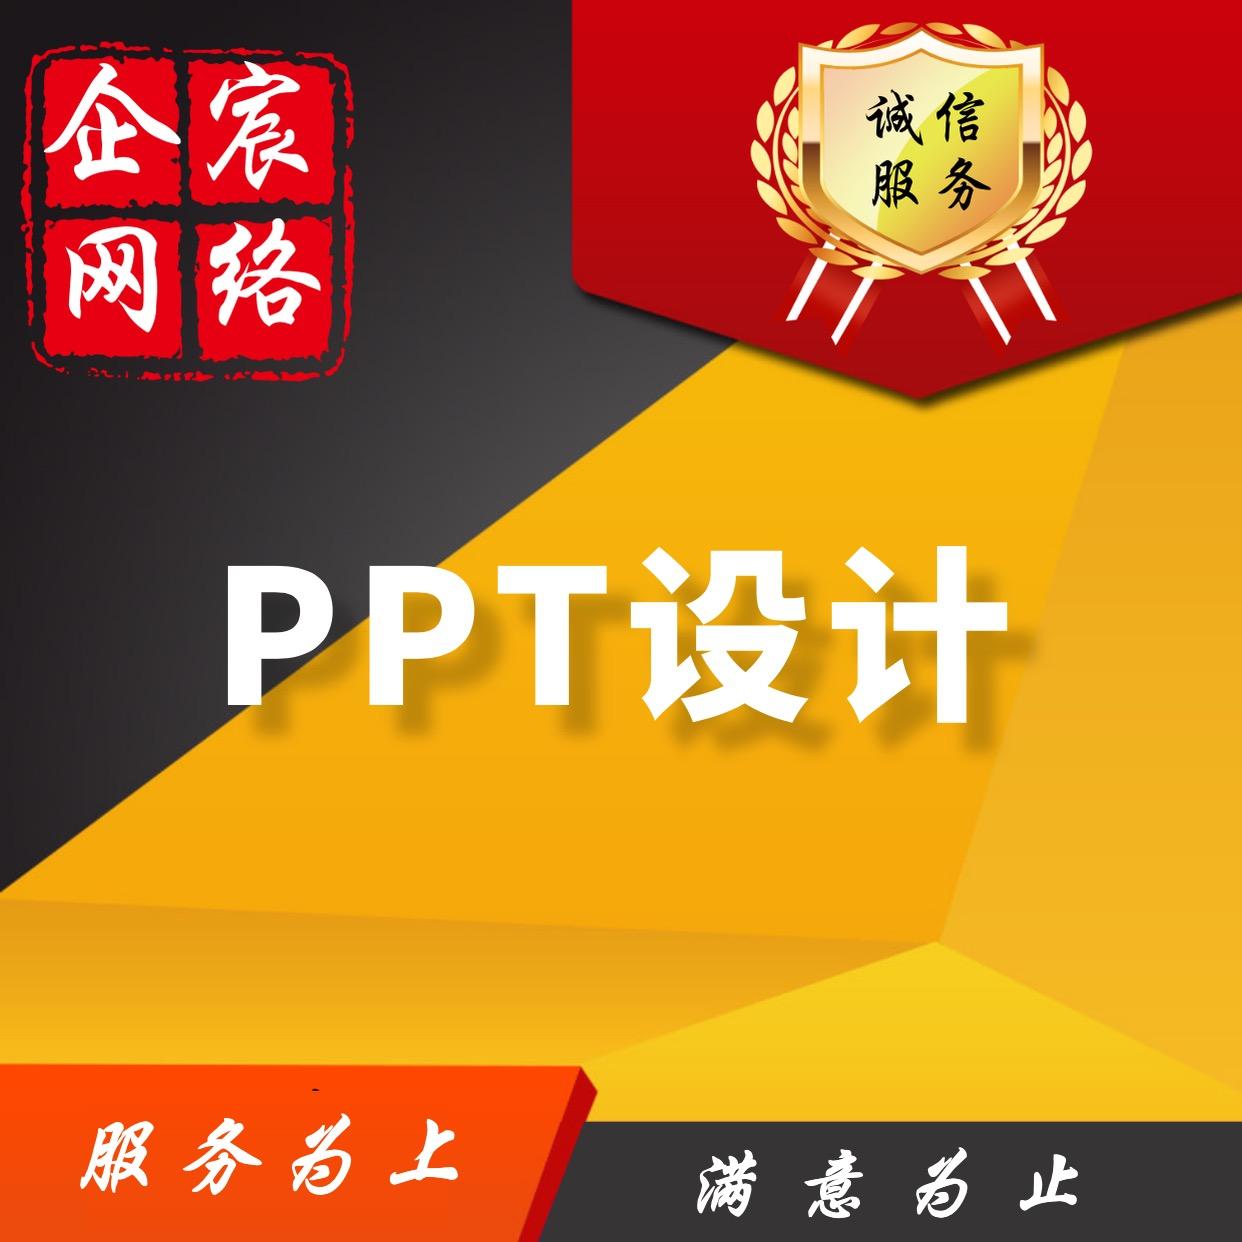 【PPT策划制作】PPT策划设计/PPT设计/活动总结汇报